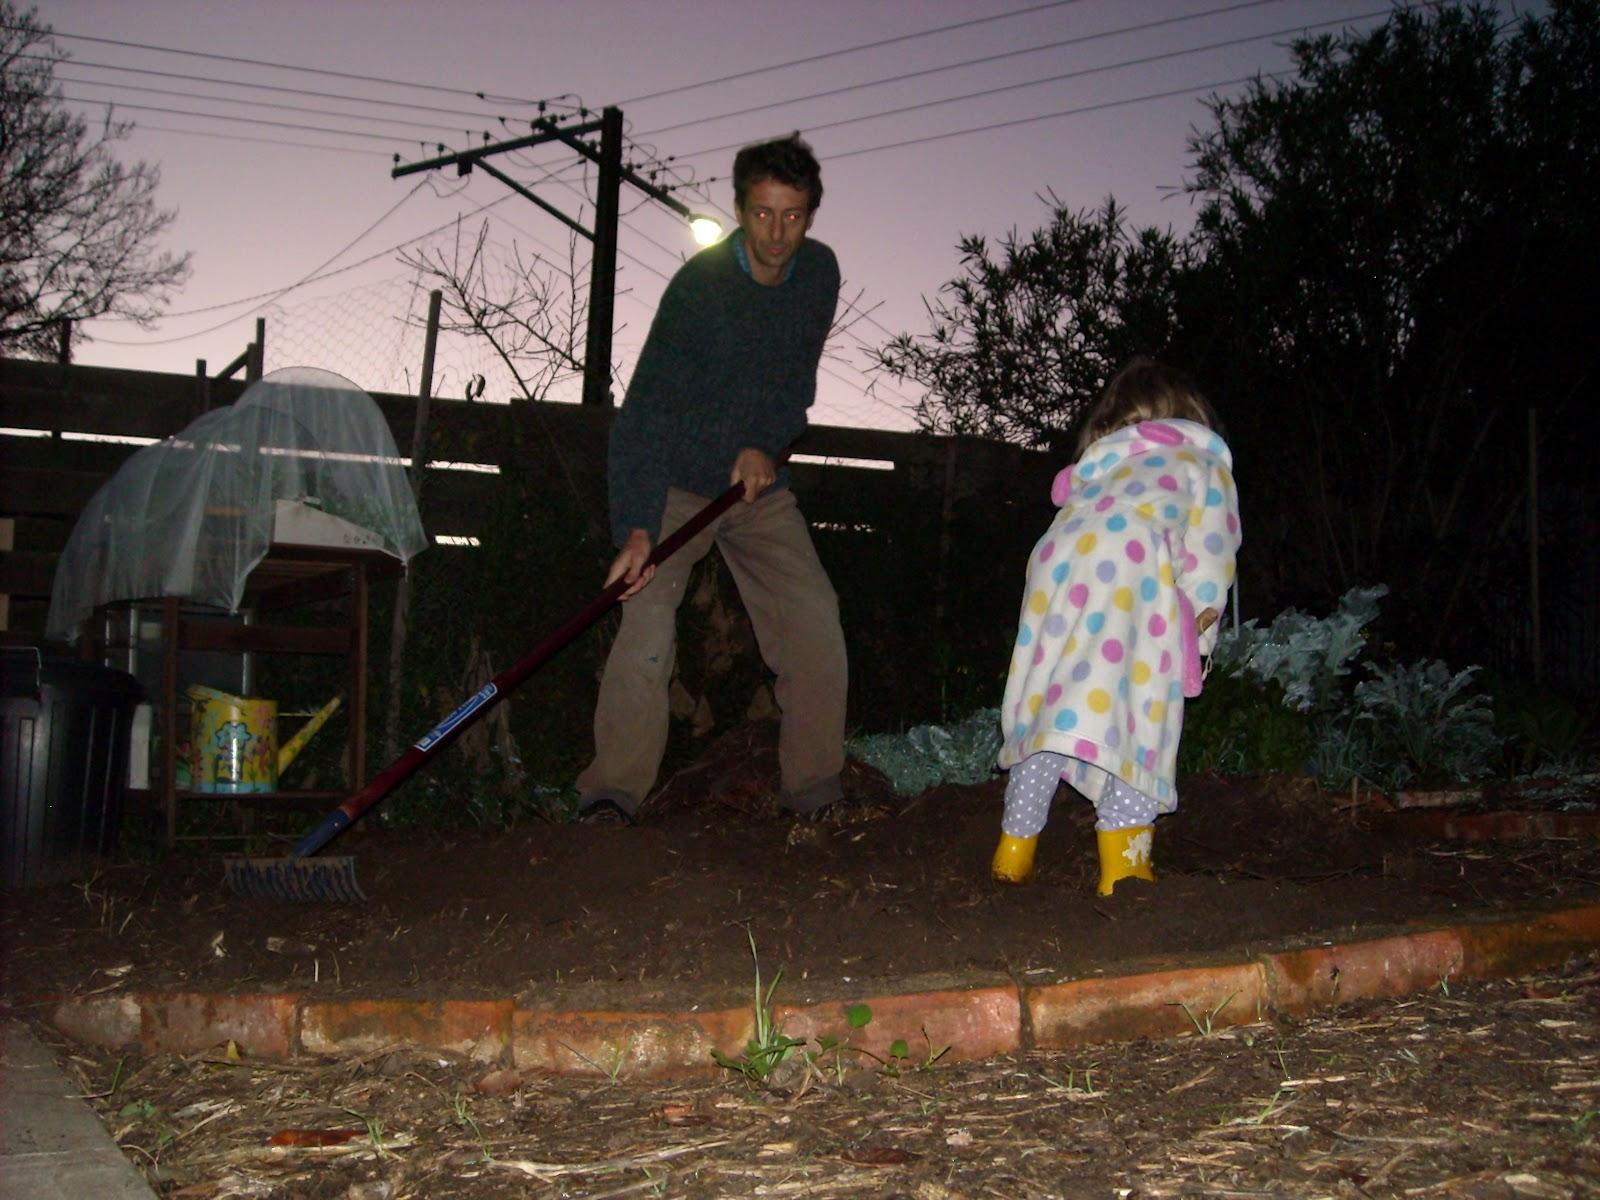 zucchini island gardeners in pyjamas